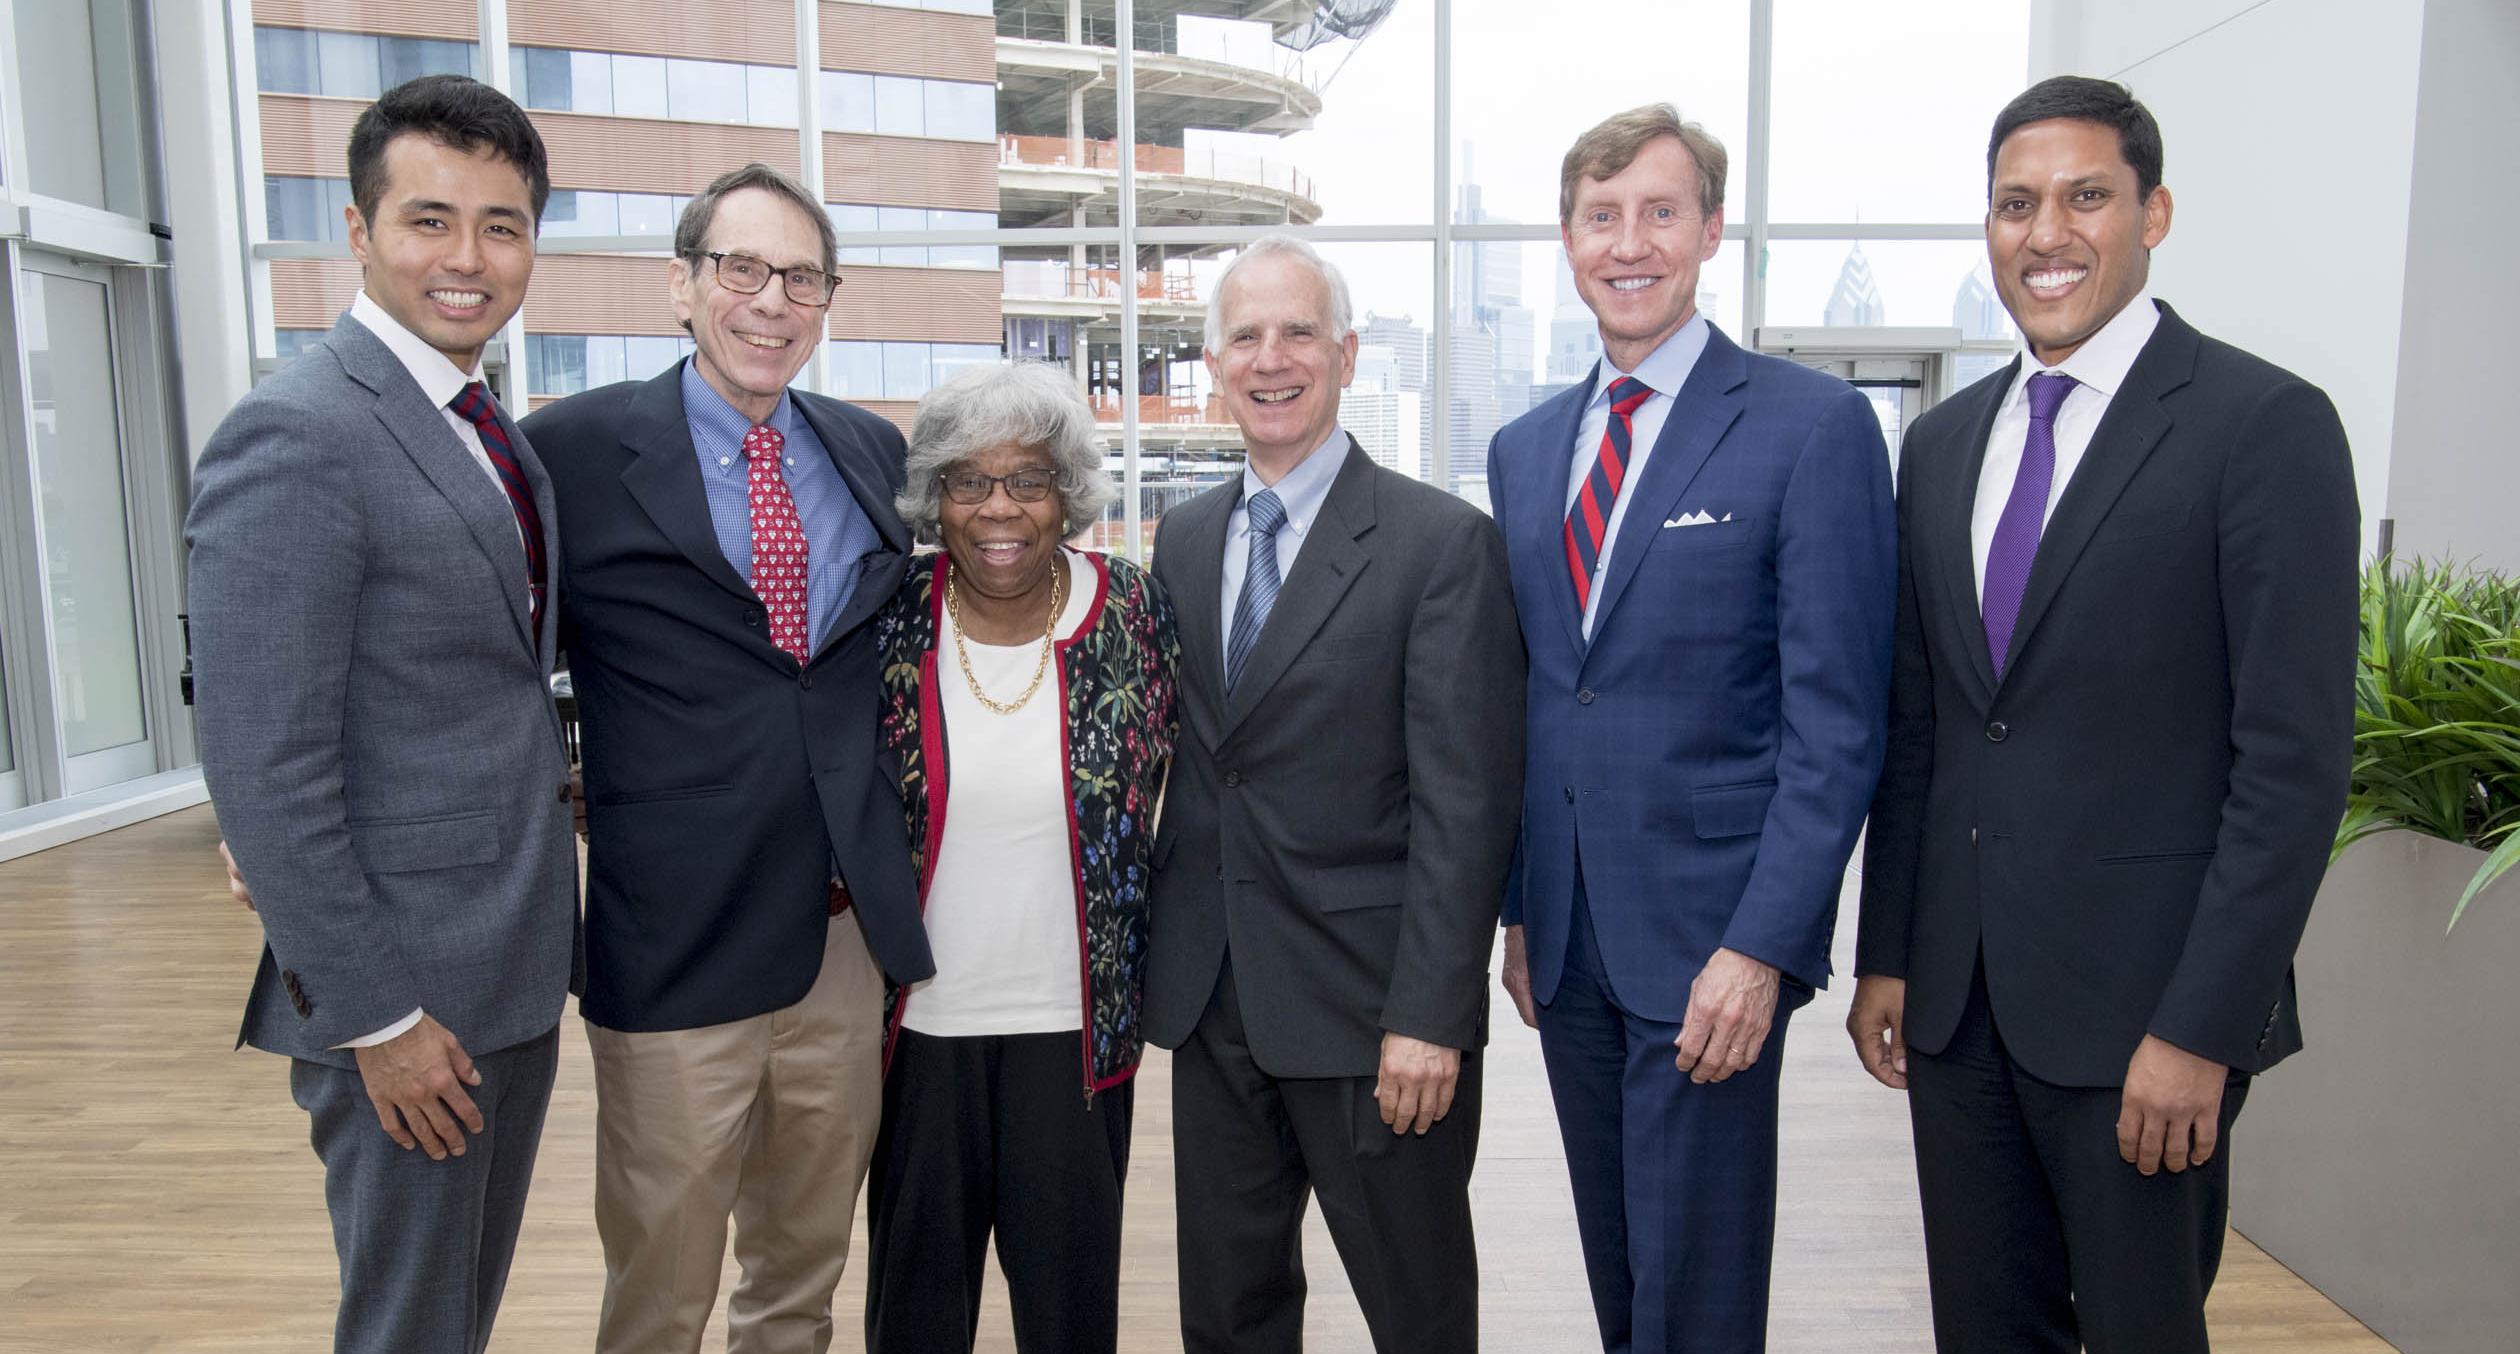 Penn Alumni - A Time to Remember: Medical Alumni Weekend Recap